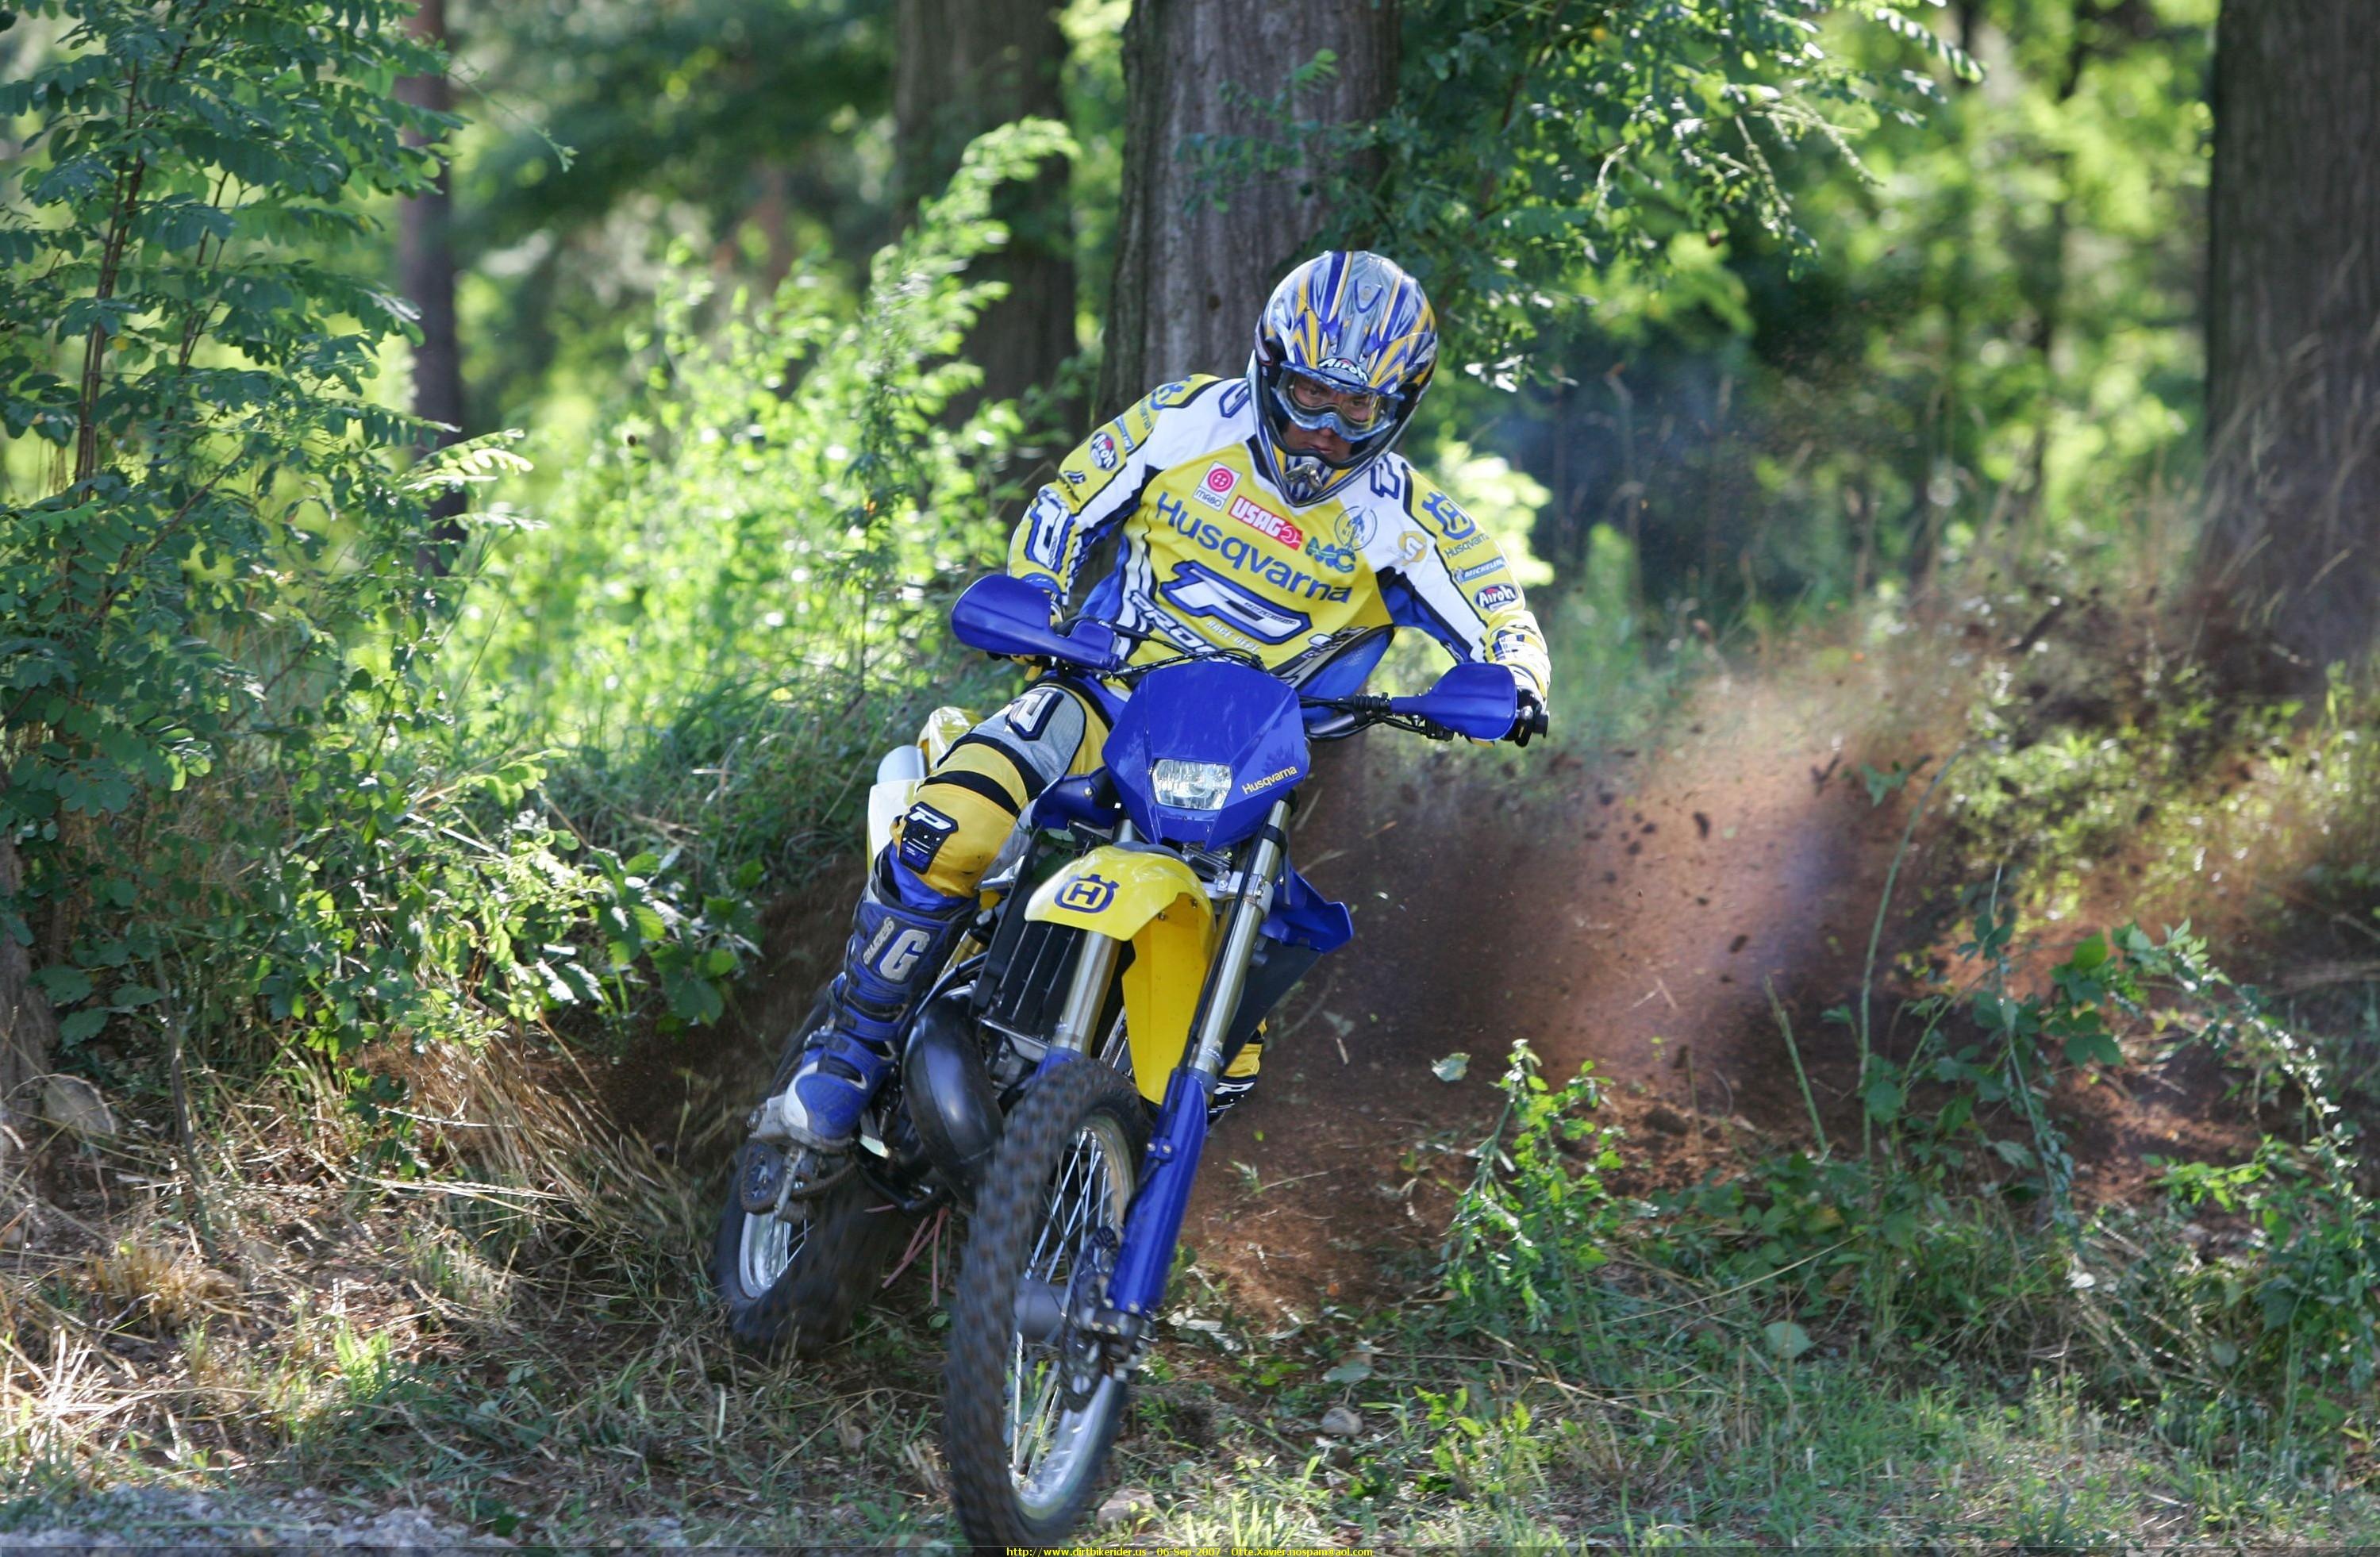 2007 Husqvarna WR 250 pic 13   onlymotorbikescom 2999x1962